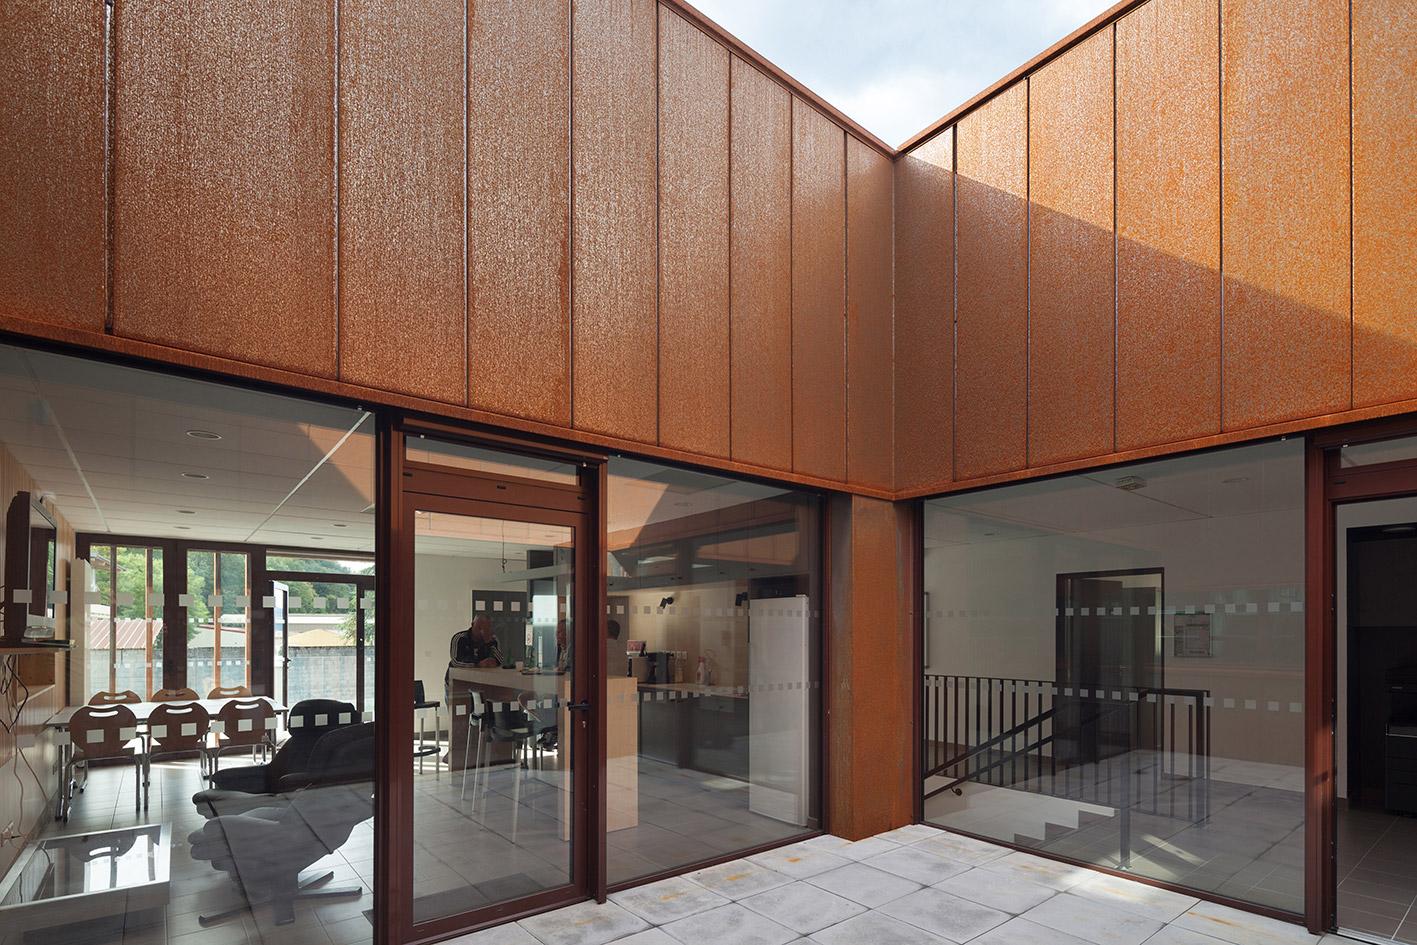 jerome-ricolleau-photographe-architecture-lyon-Composite-grenoble-sdis-caserne-pompiers-seyssel-9